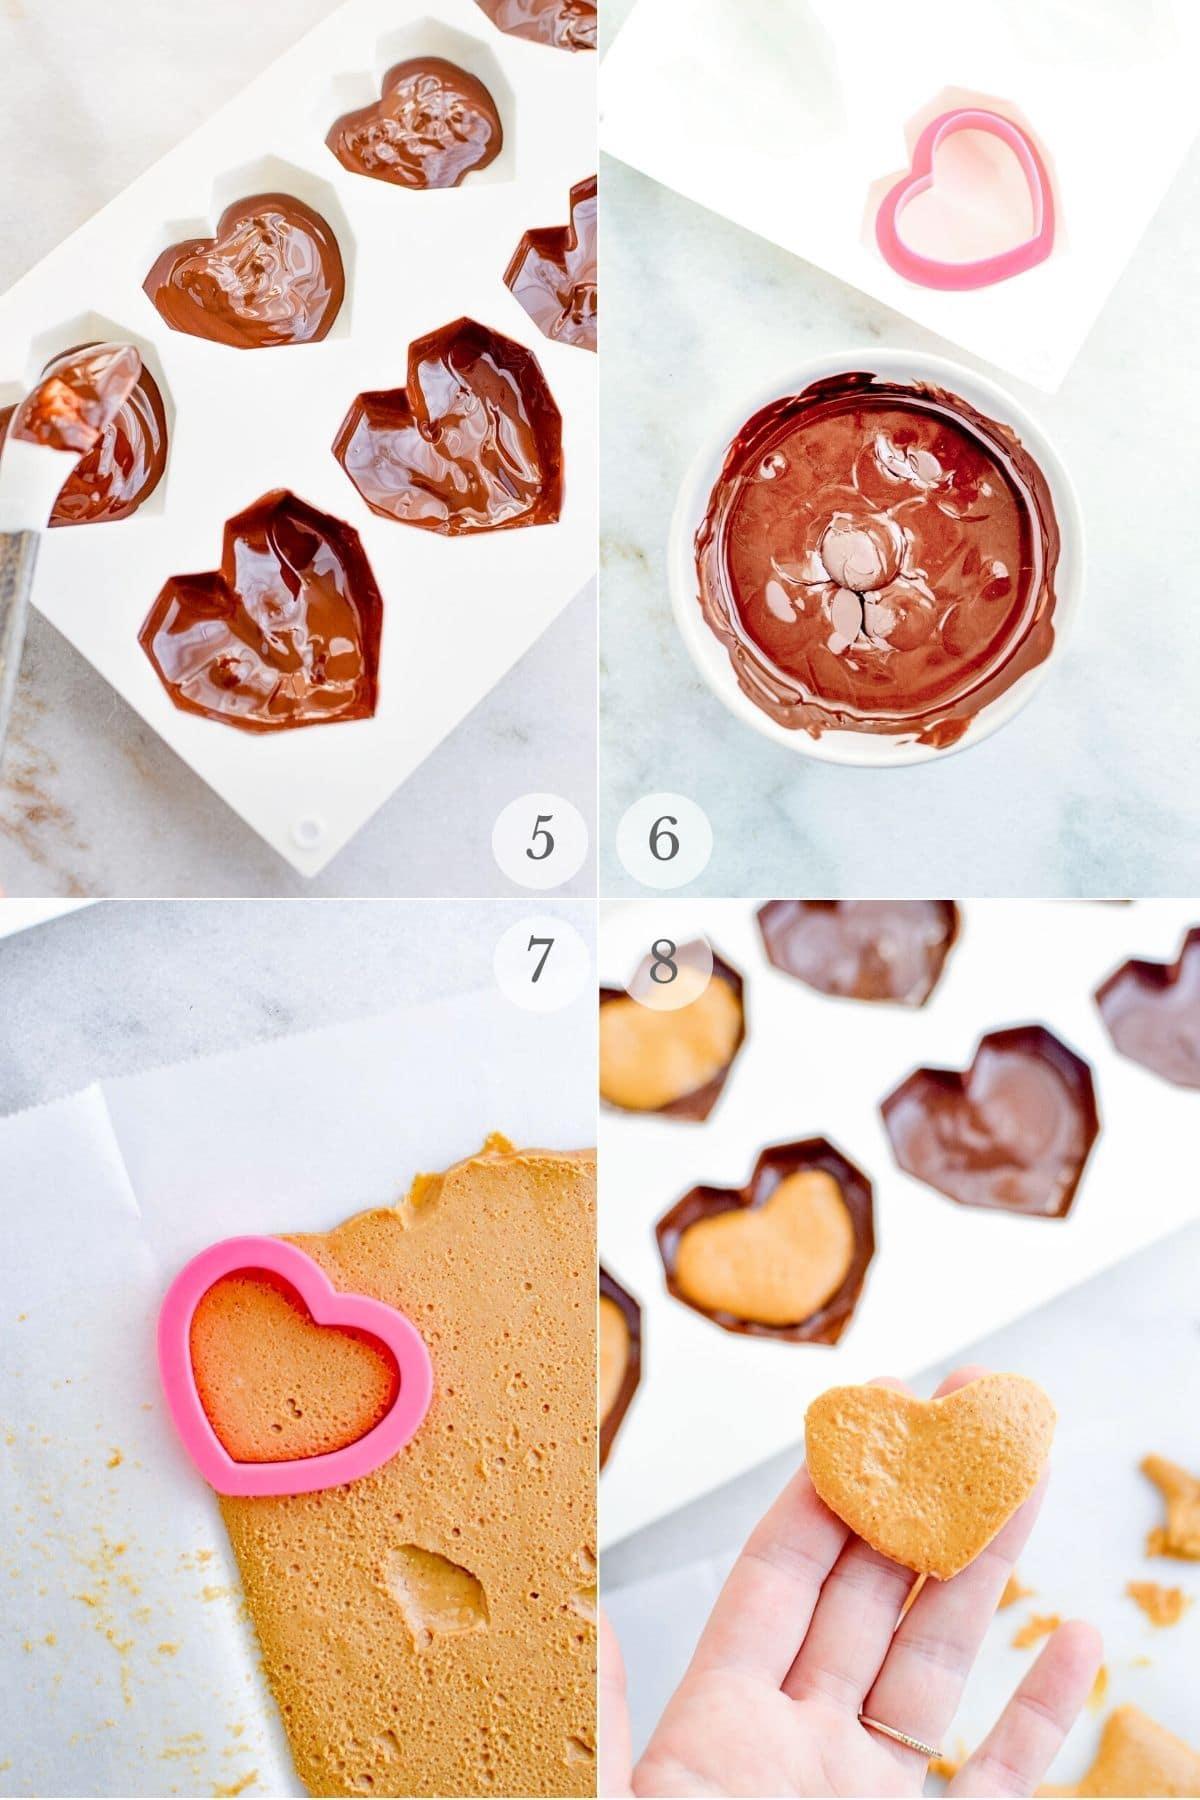 homemade peanut butter cups recipes steps 5-8a